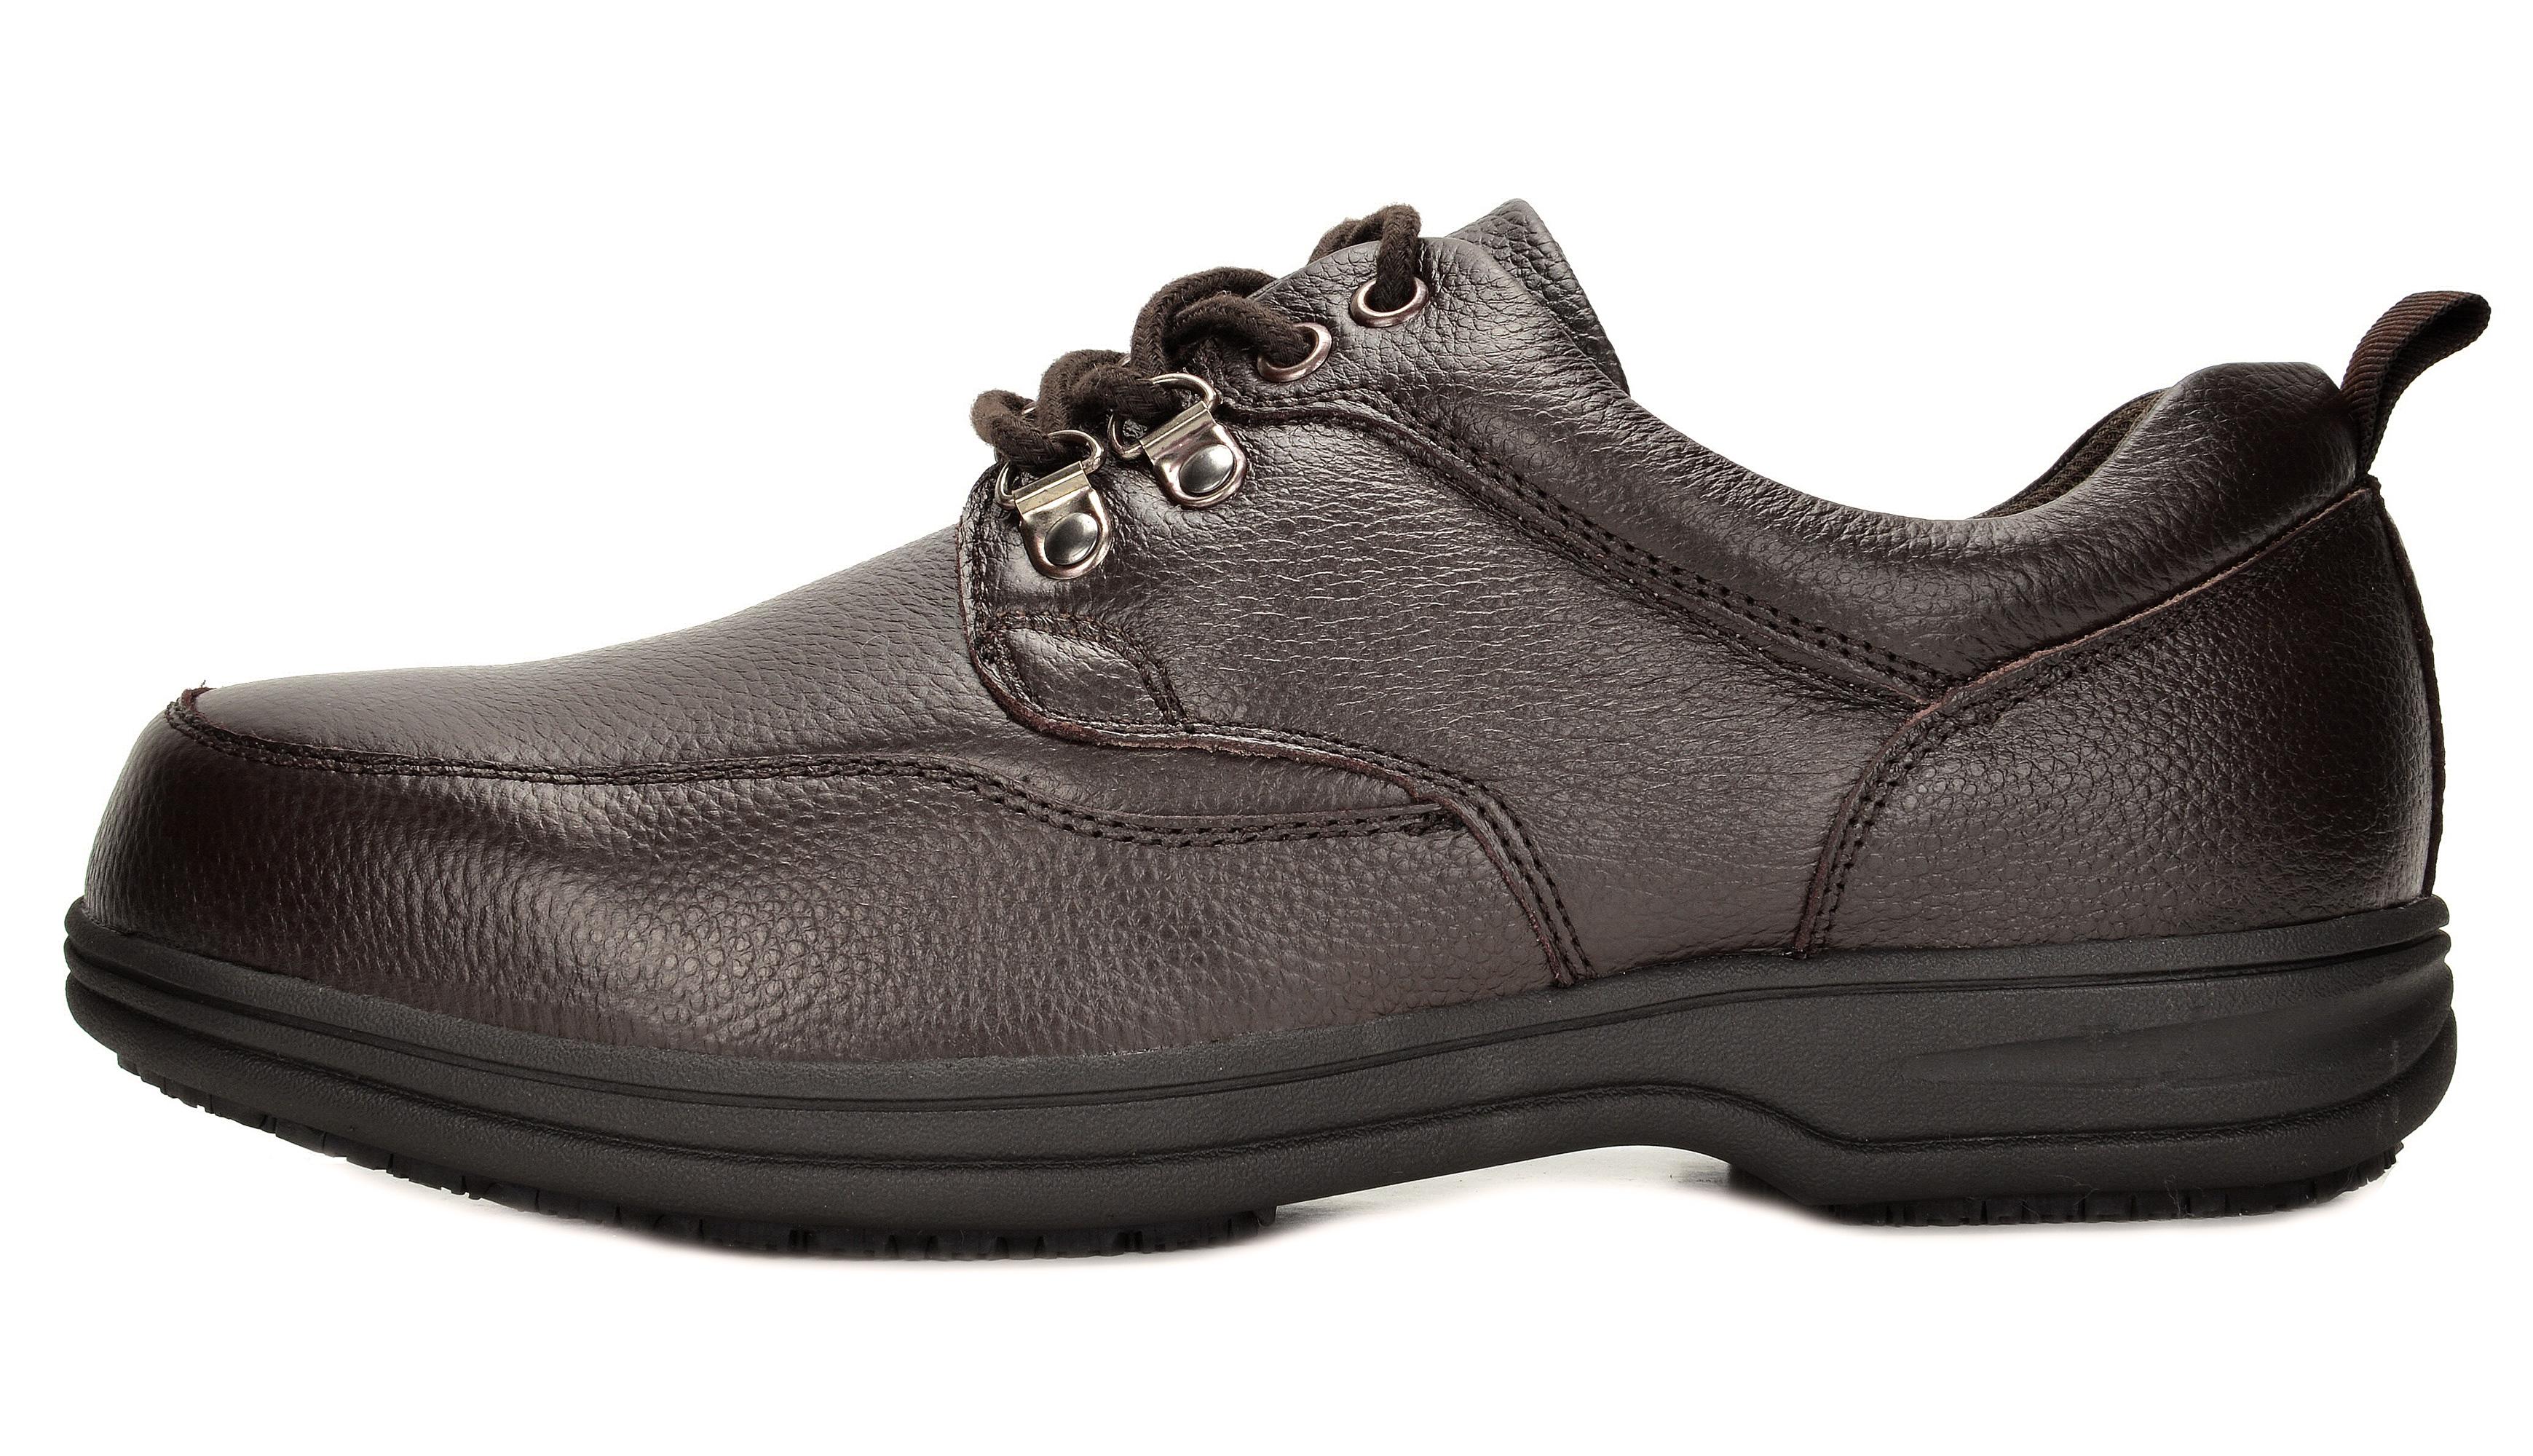 Details About Dream Pairs Men Restaurant Slip Resistant Classic Lace Up Oxfords Work Shoes